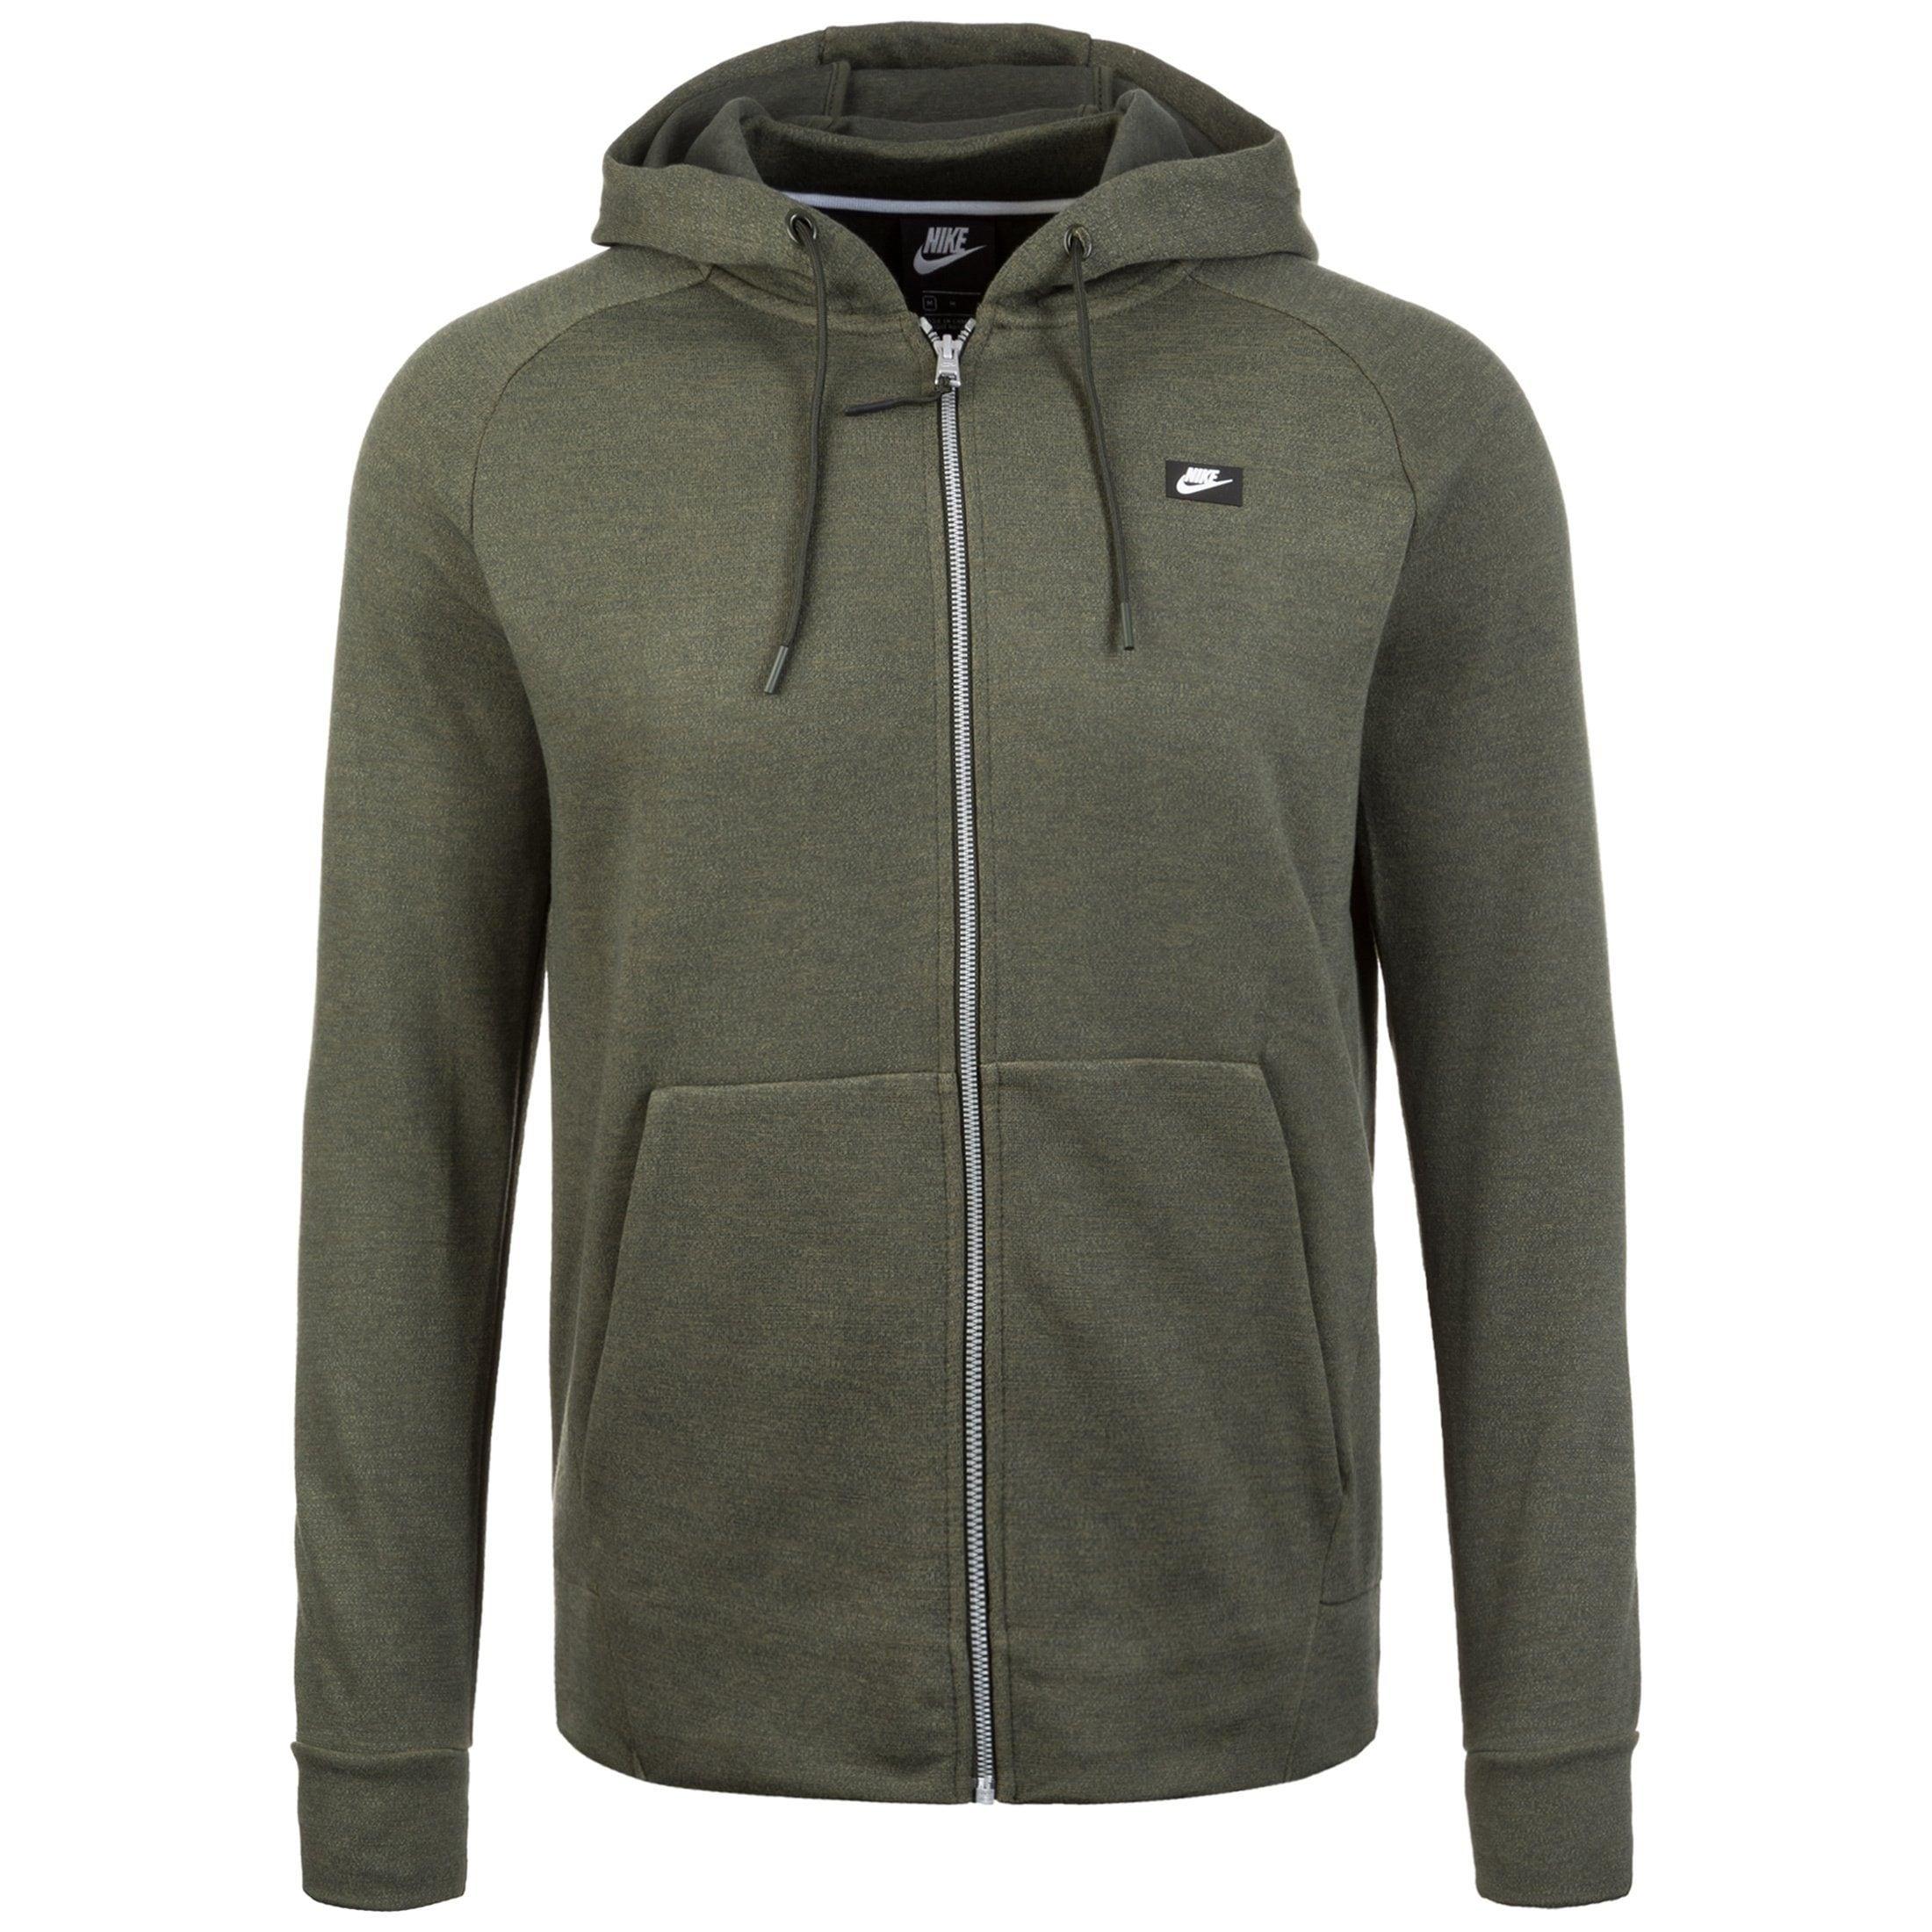 Nike Sportswear Kapuzensweatjacke Optic Fleece | Sportbekleidung > Sportjacken > Sonstige Sportjacken | Grün | Fleece - Gummi | Nike Sportswear